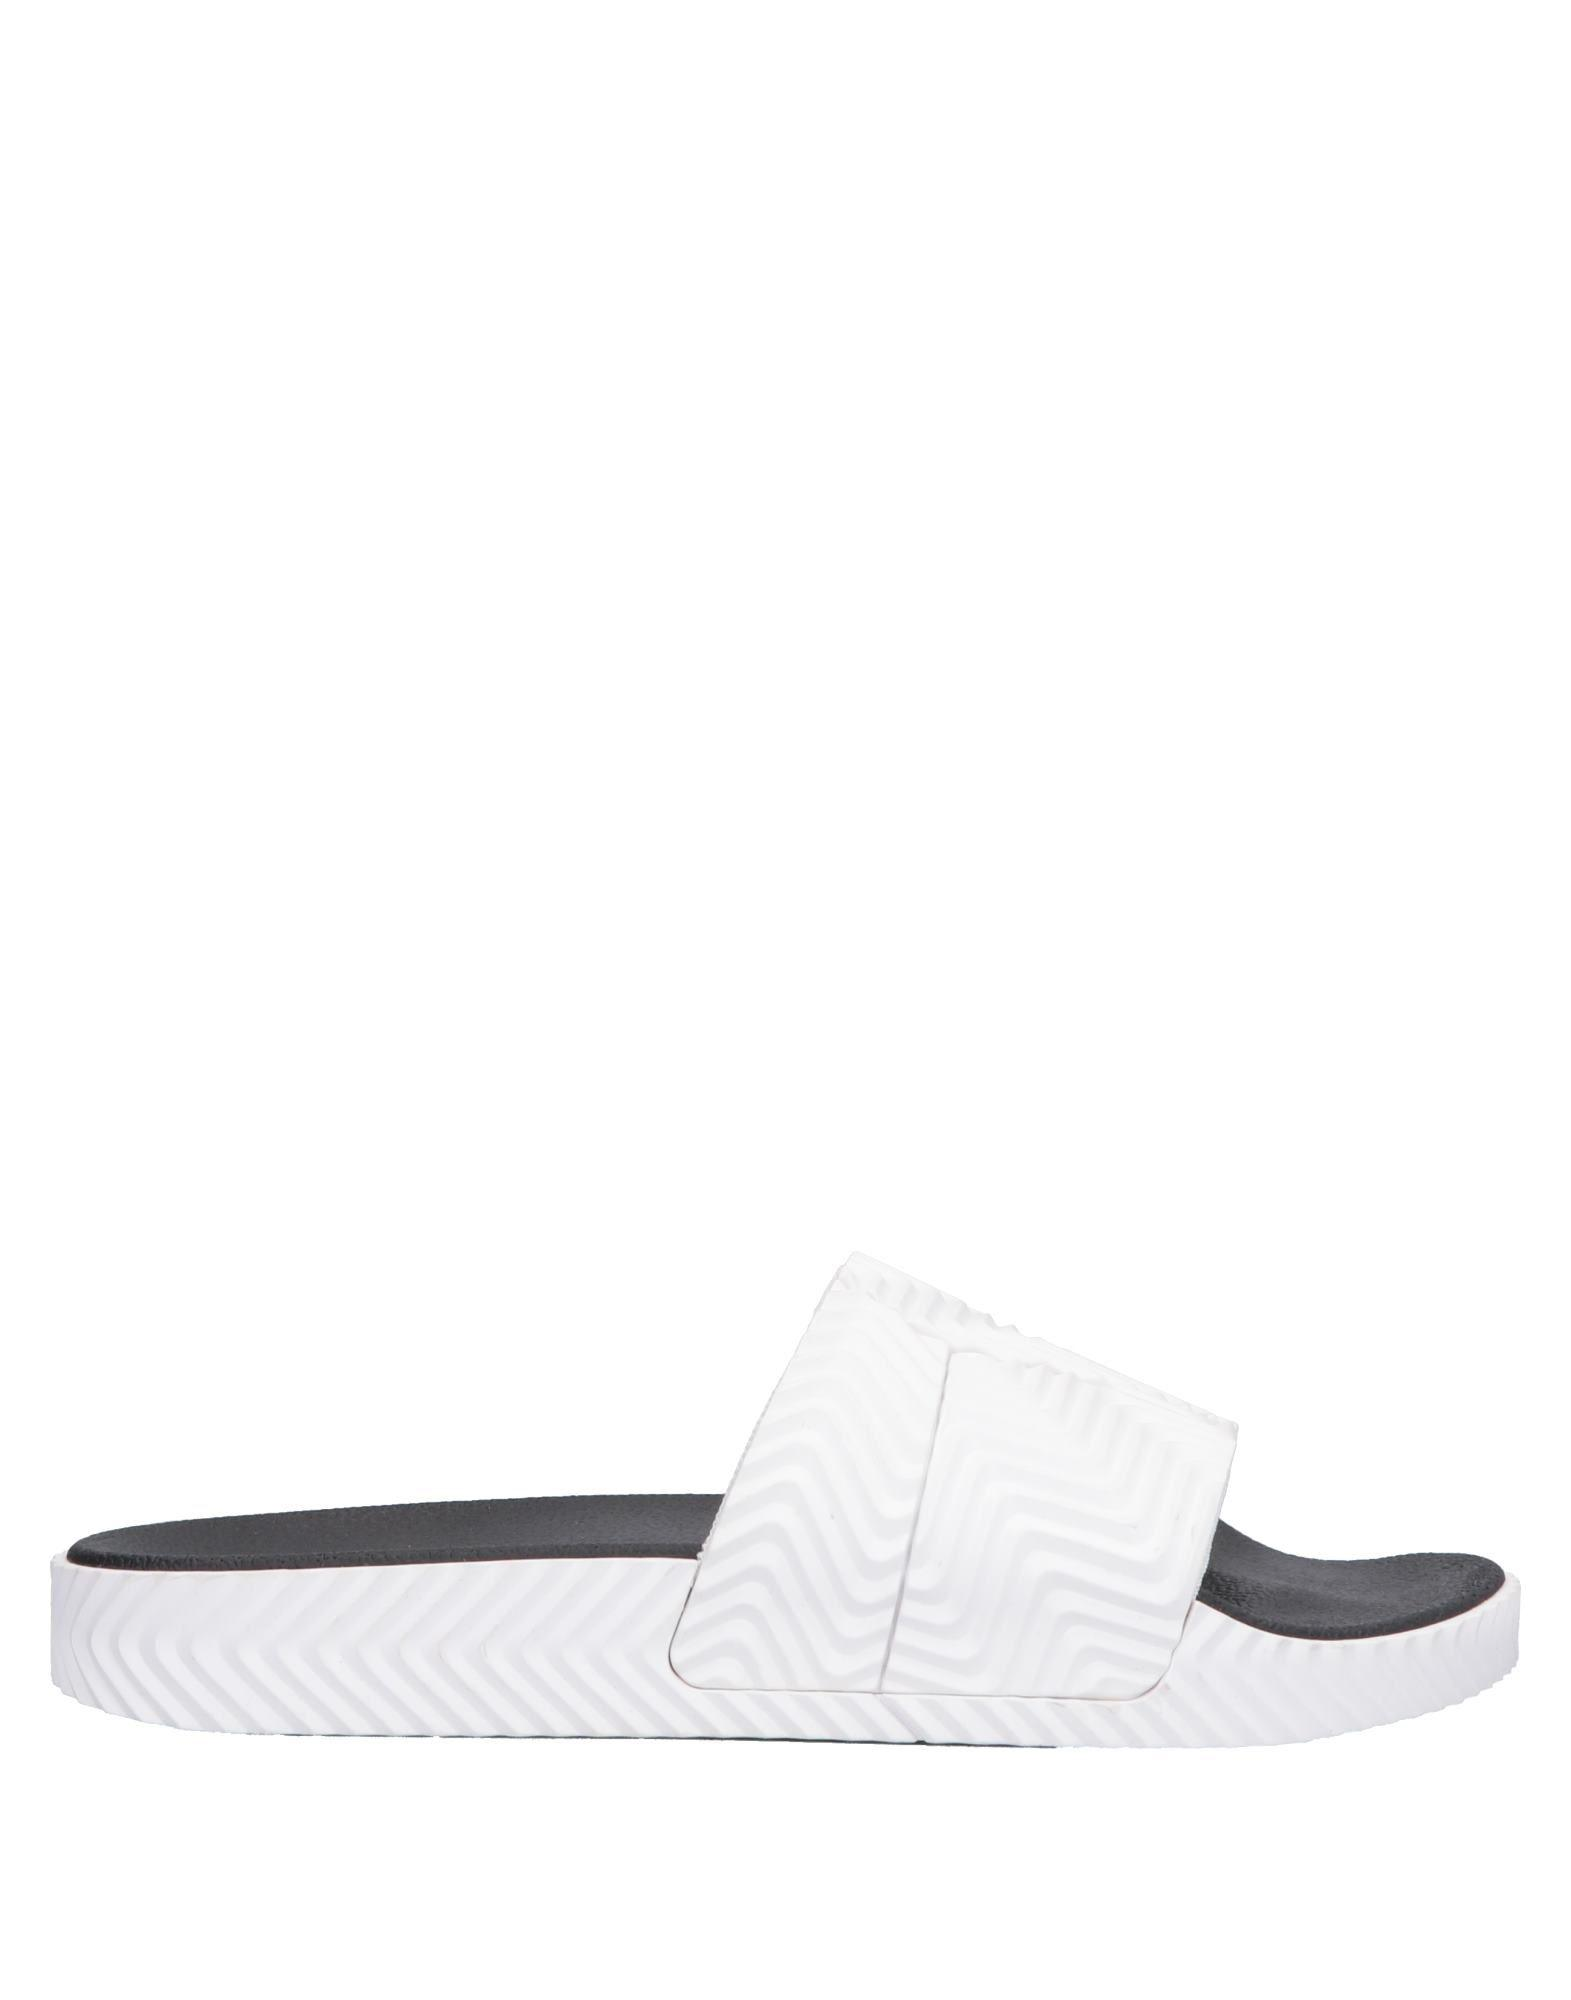 6b1d1a9d81f Lyst - Adidas Originals Sandals in White for Men